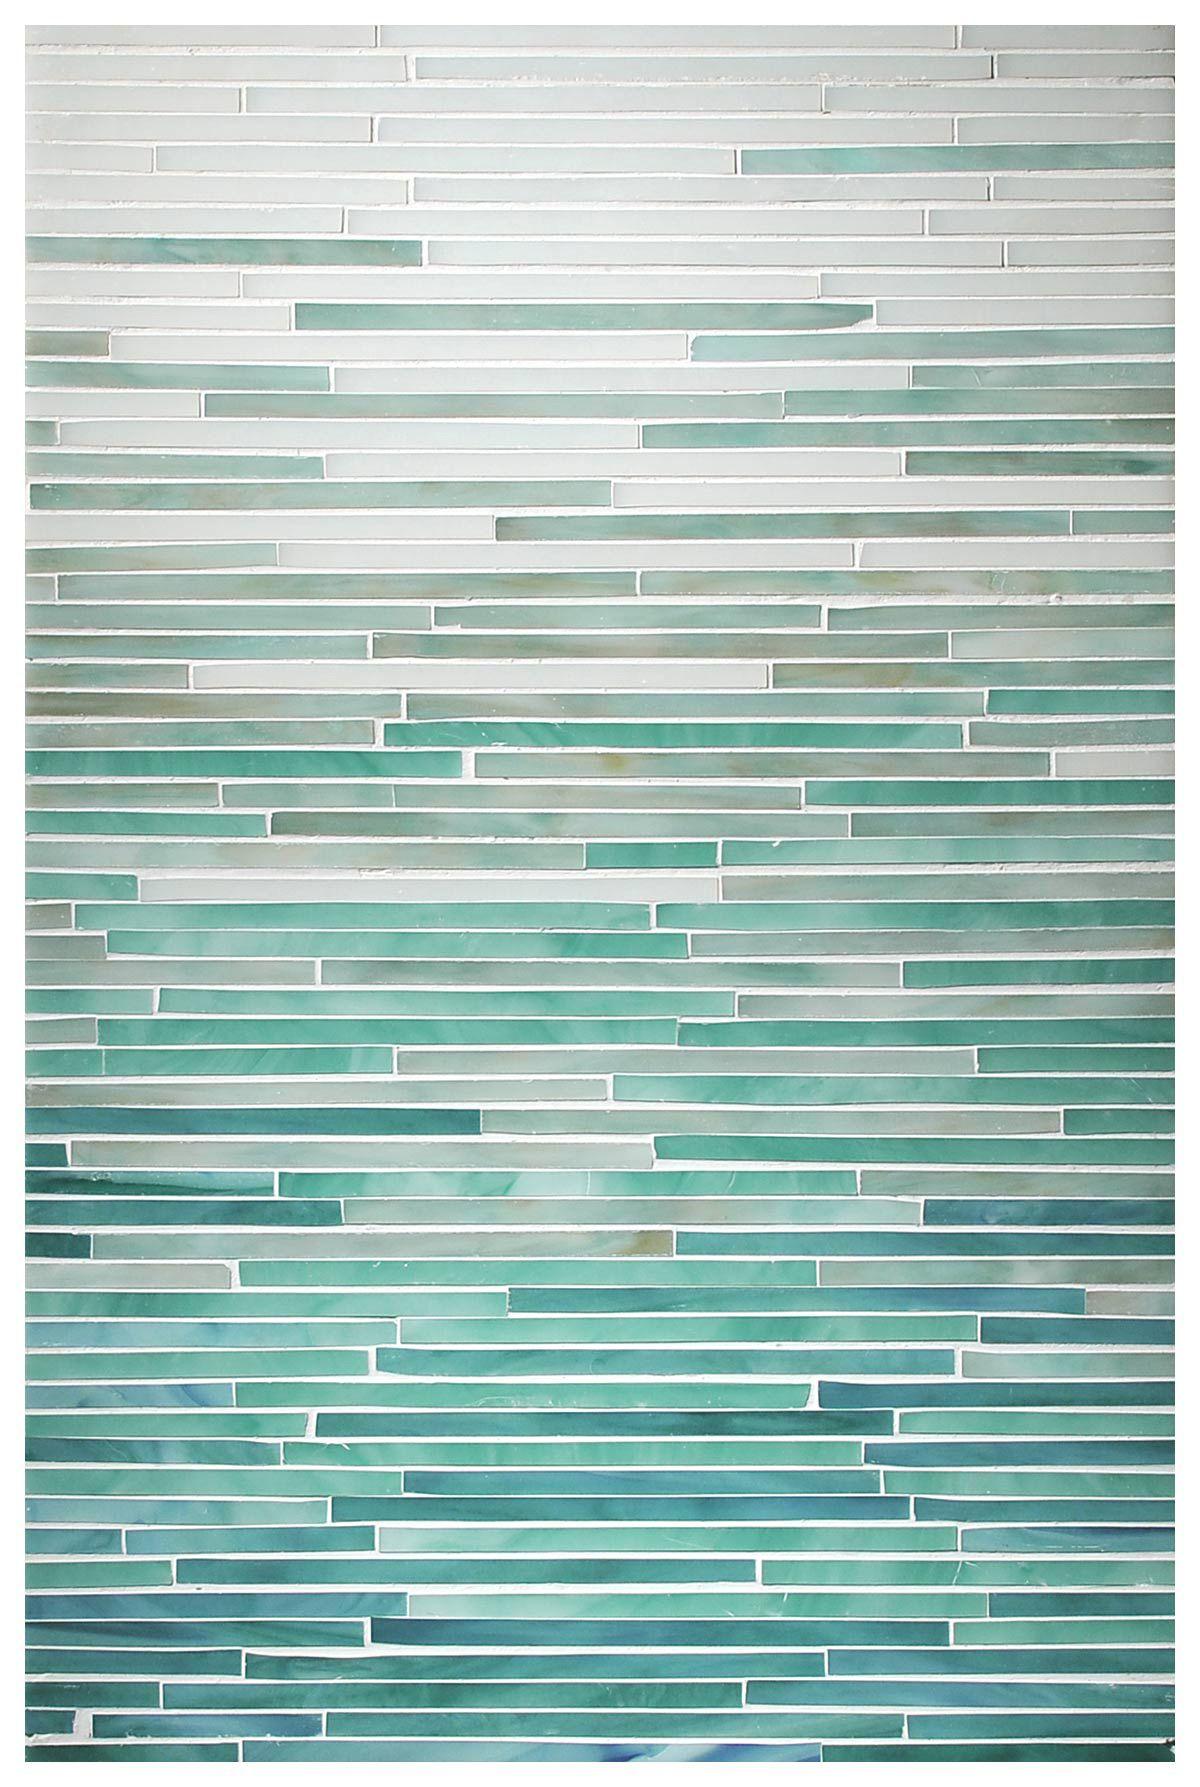 Turquoise Tile opal, aqua, turquoise, peacock topaz , ombre tile, glass, katami